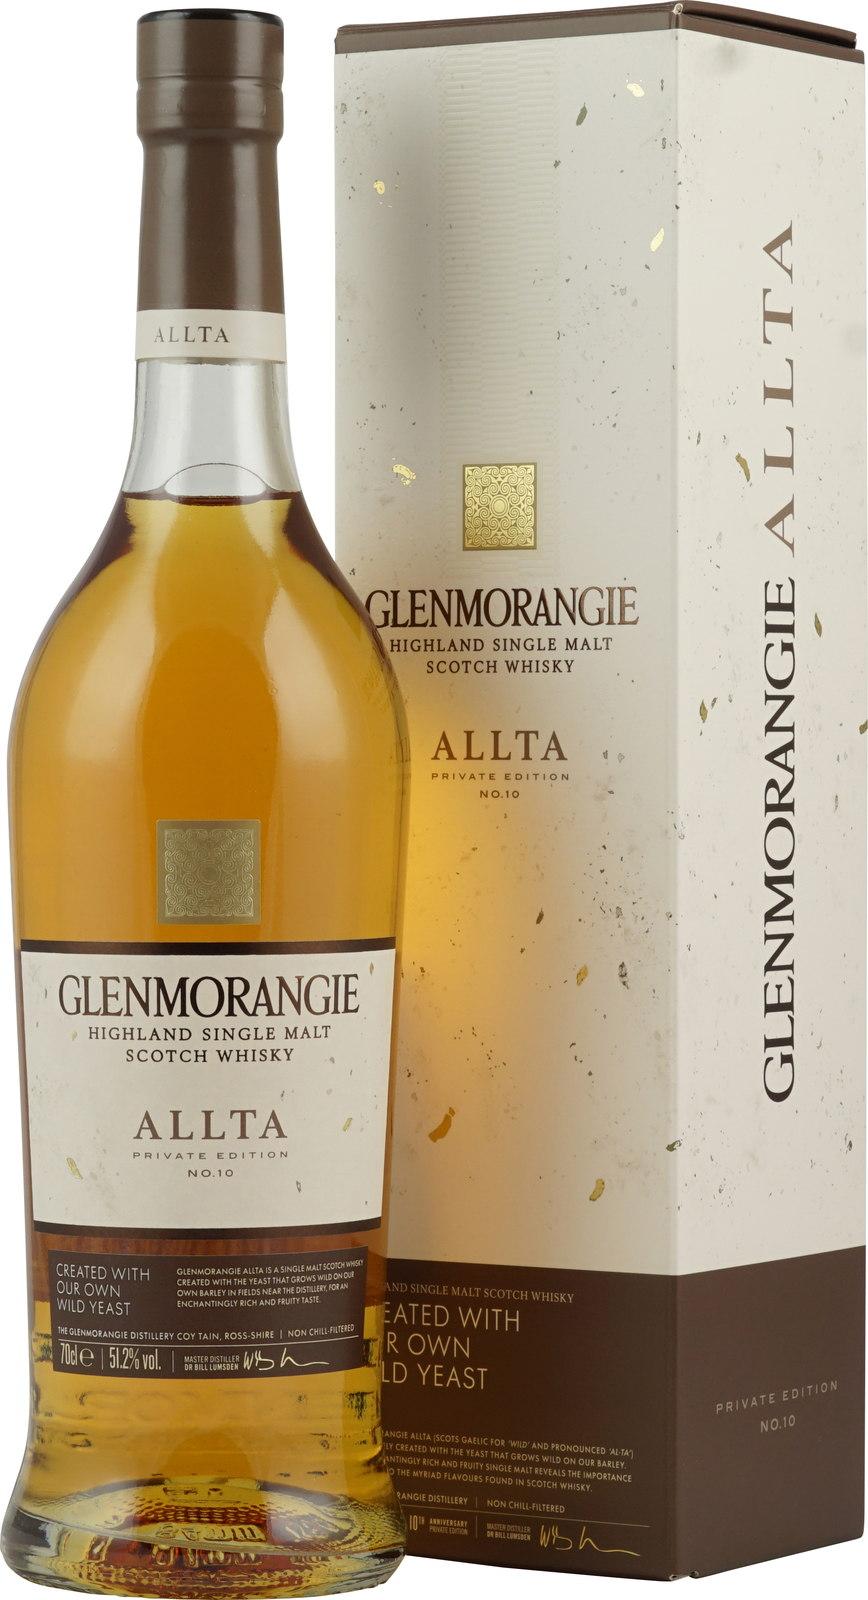 Glenmorangie Allta 07 Liter 512 Vol